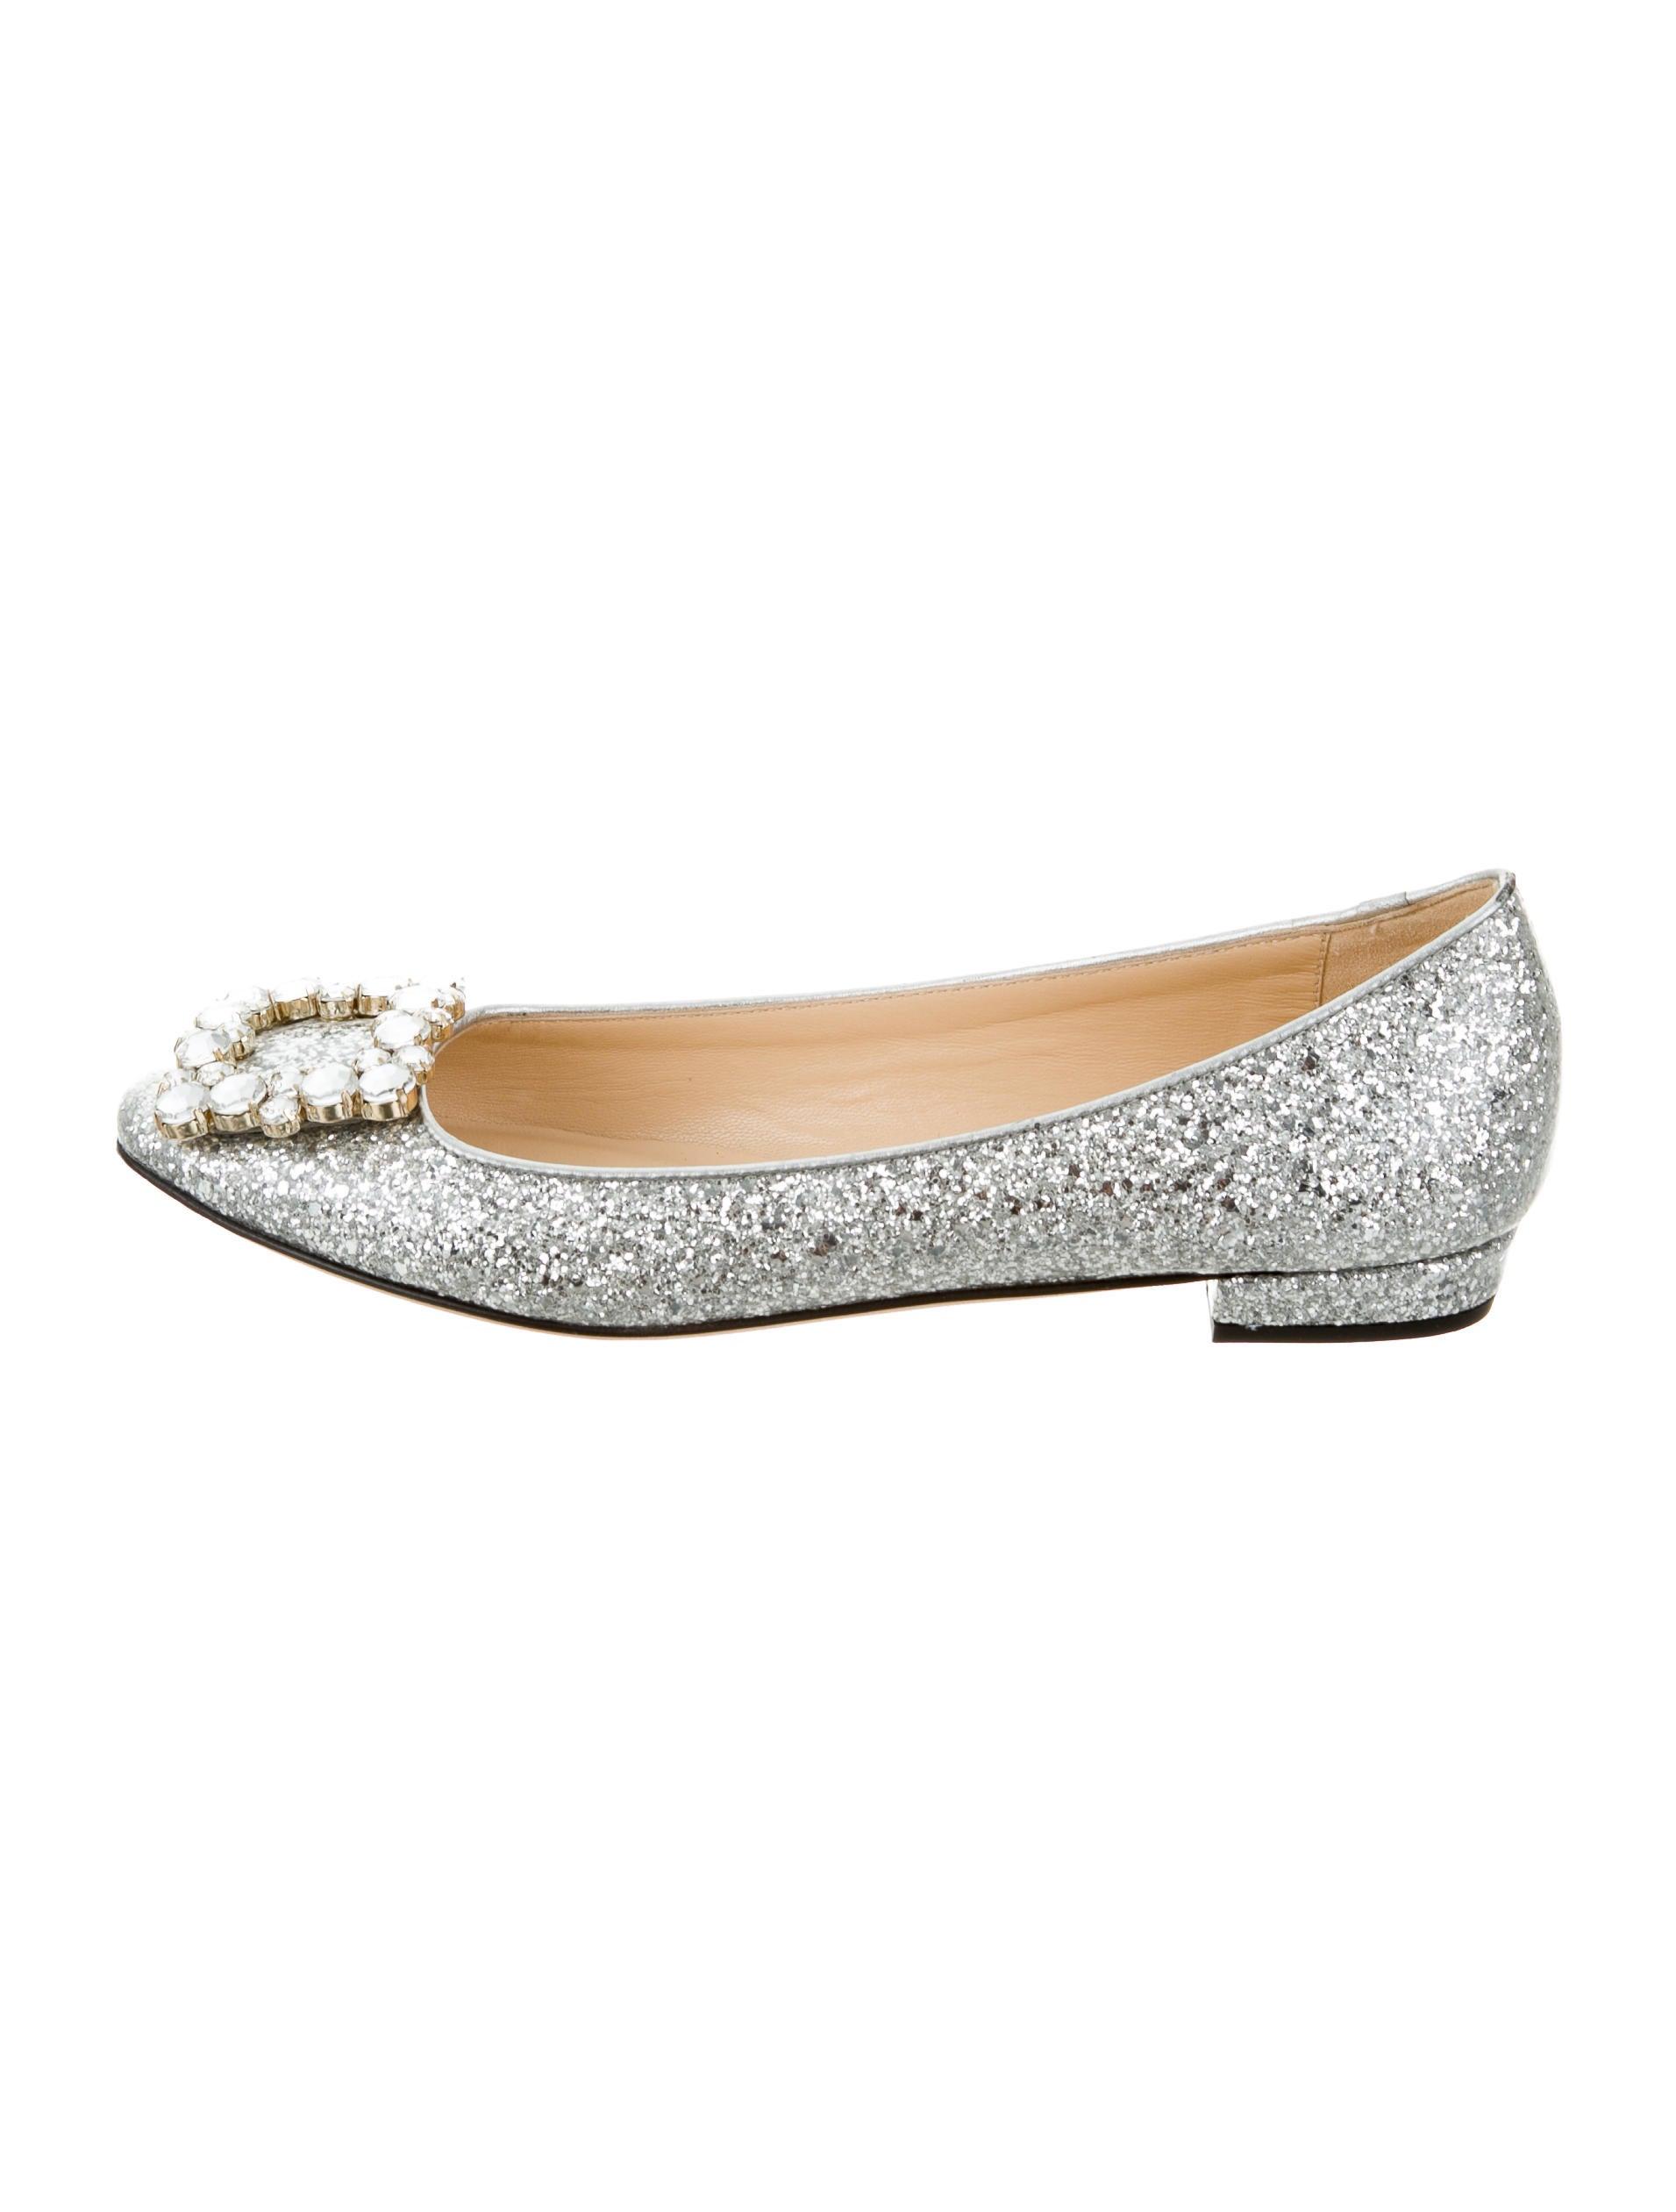 Kate spade new york embellished glitter flats shoes for Kate spade new york flats